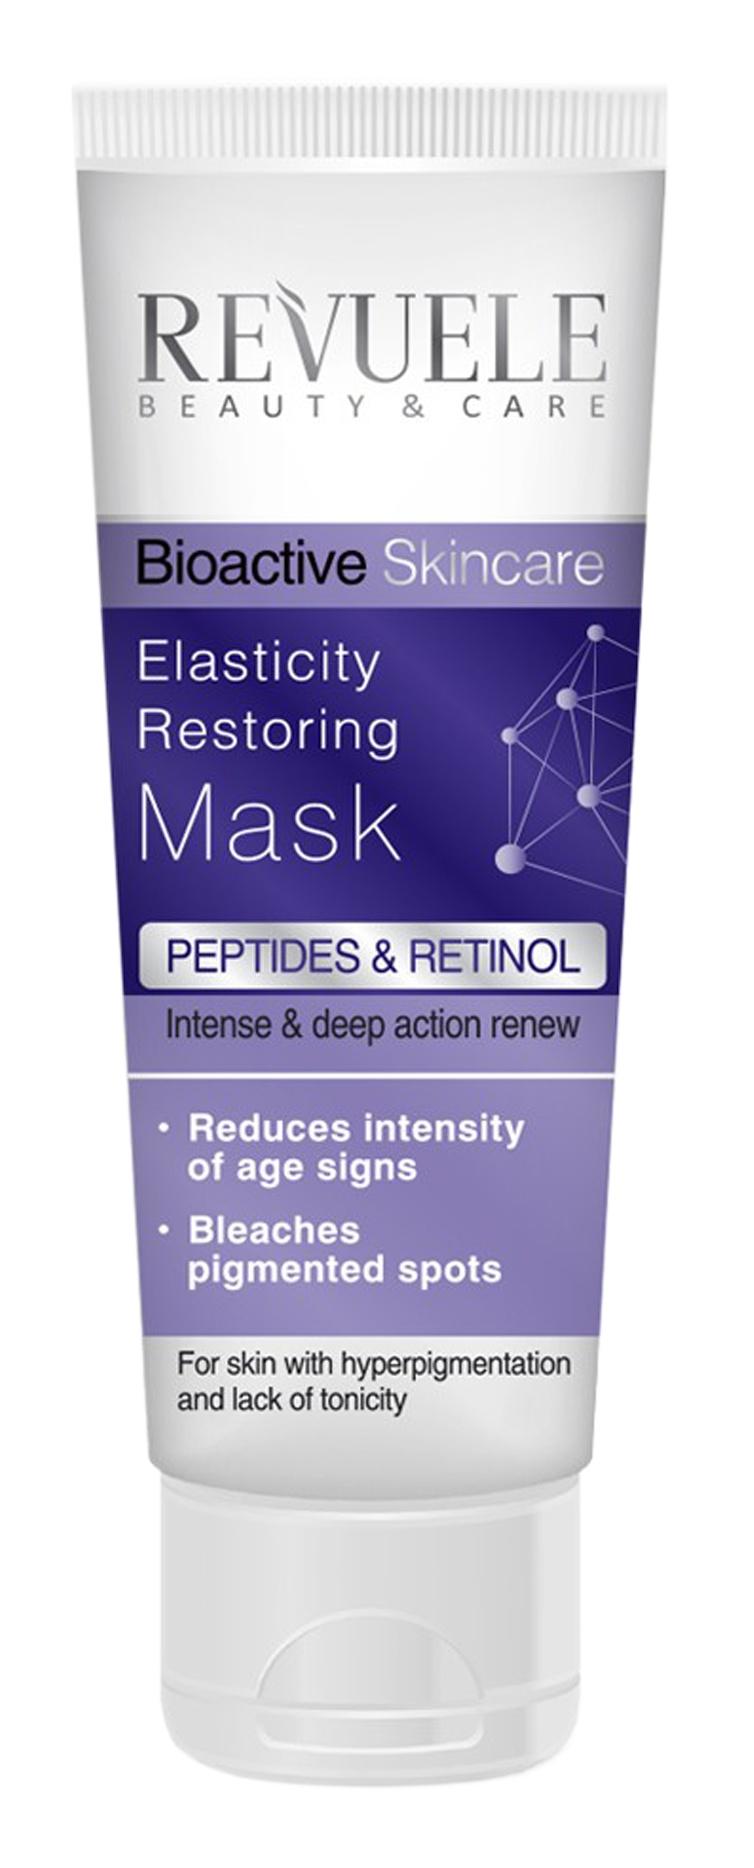 Revuele Elasticity Restoring Mask